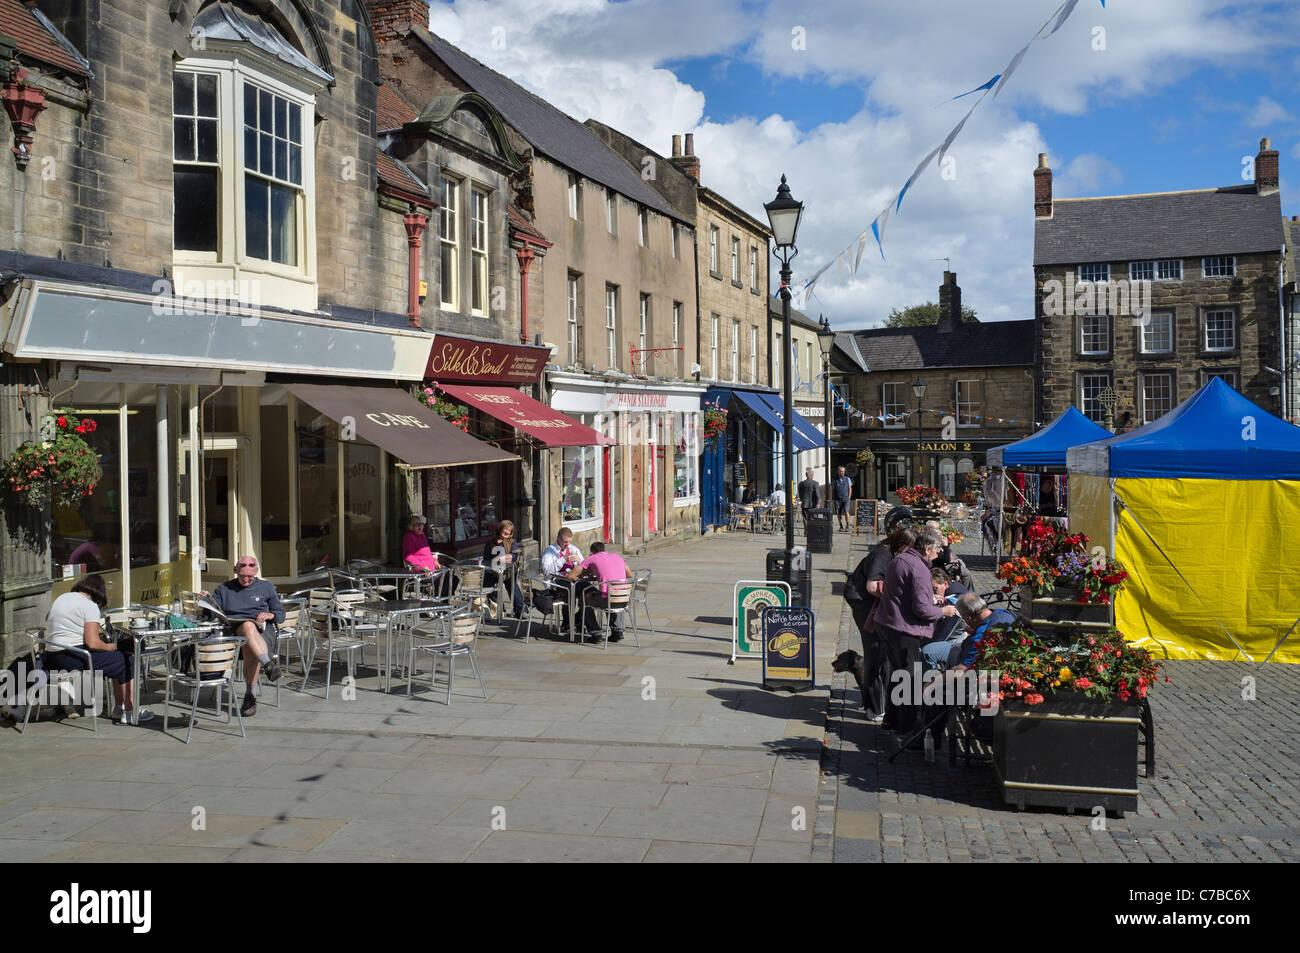 Alnwick Market Square - Stock Image